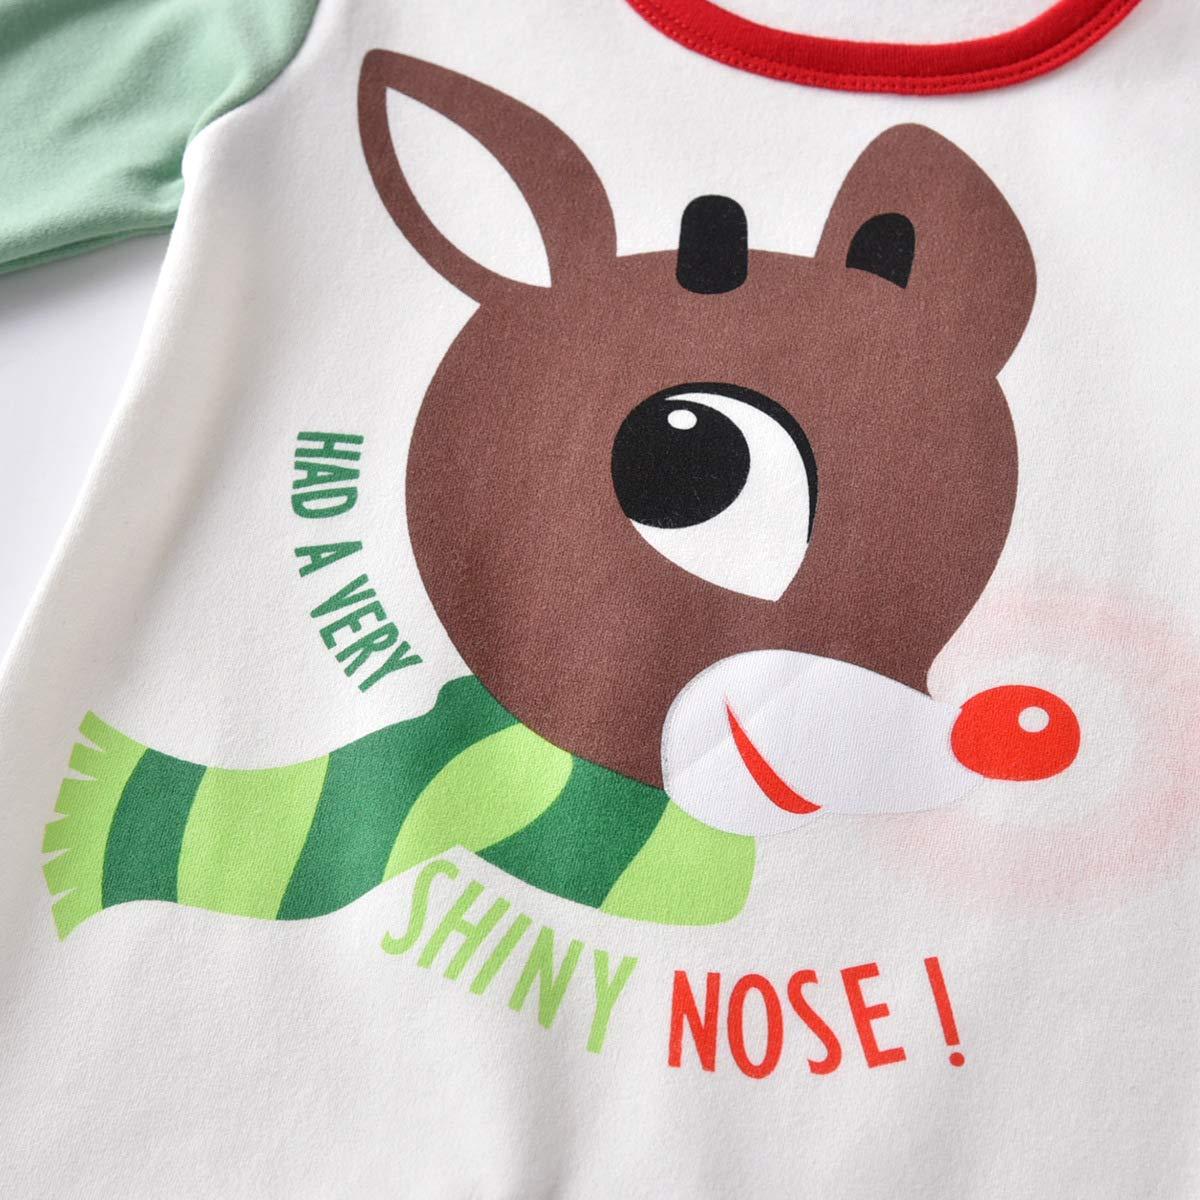 Gagacity Weihnachtskleidung Baby Strampler Unisex Neugeborene Overall Pyjamas Baumwolle f/ür 0-24Monate